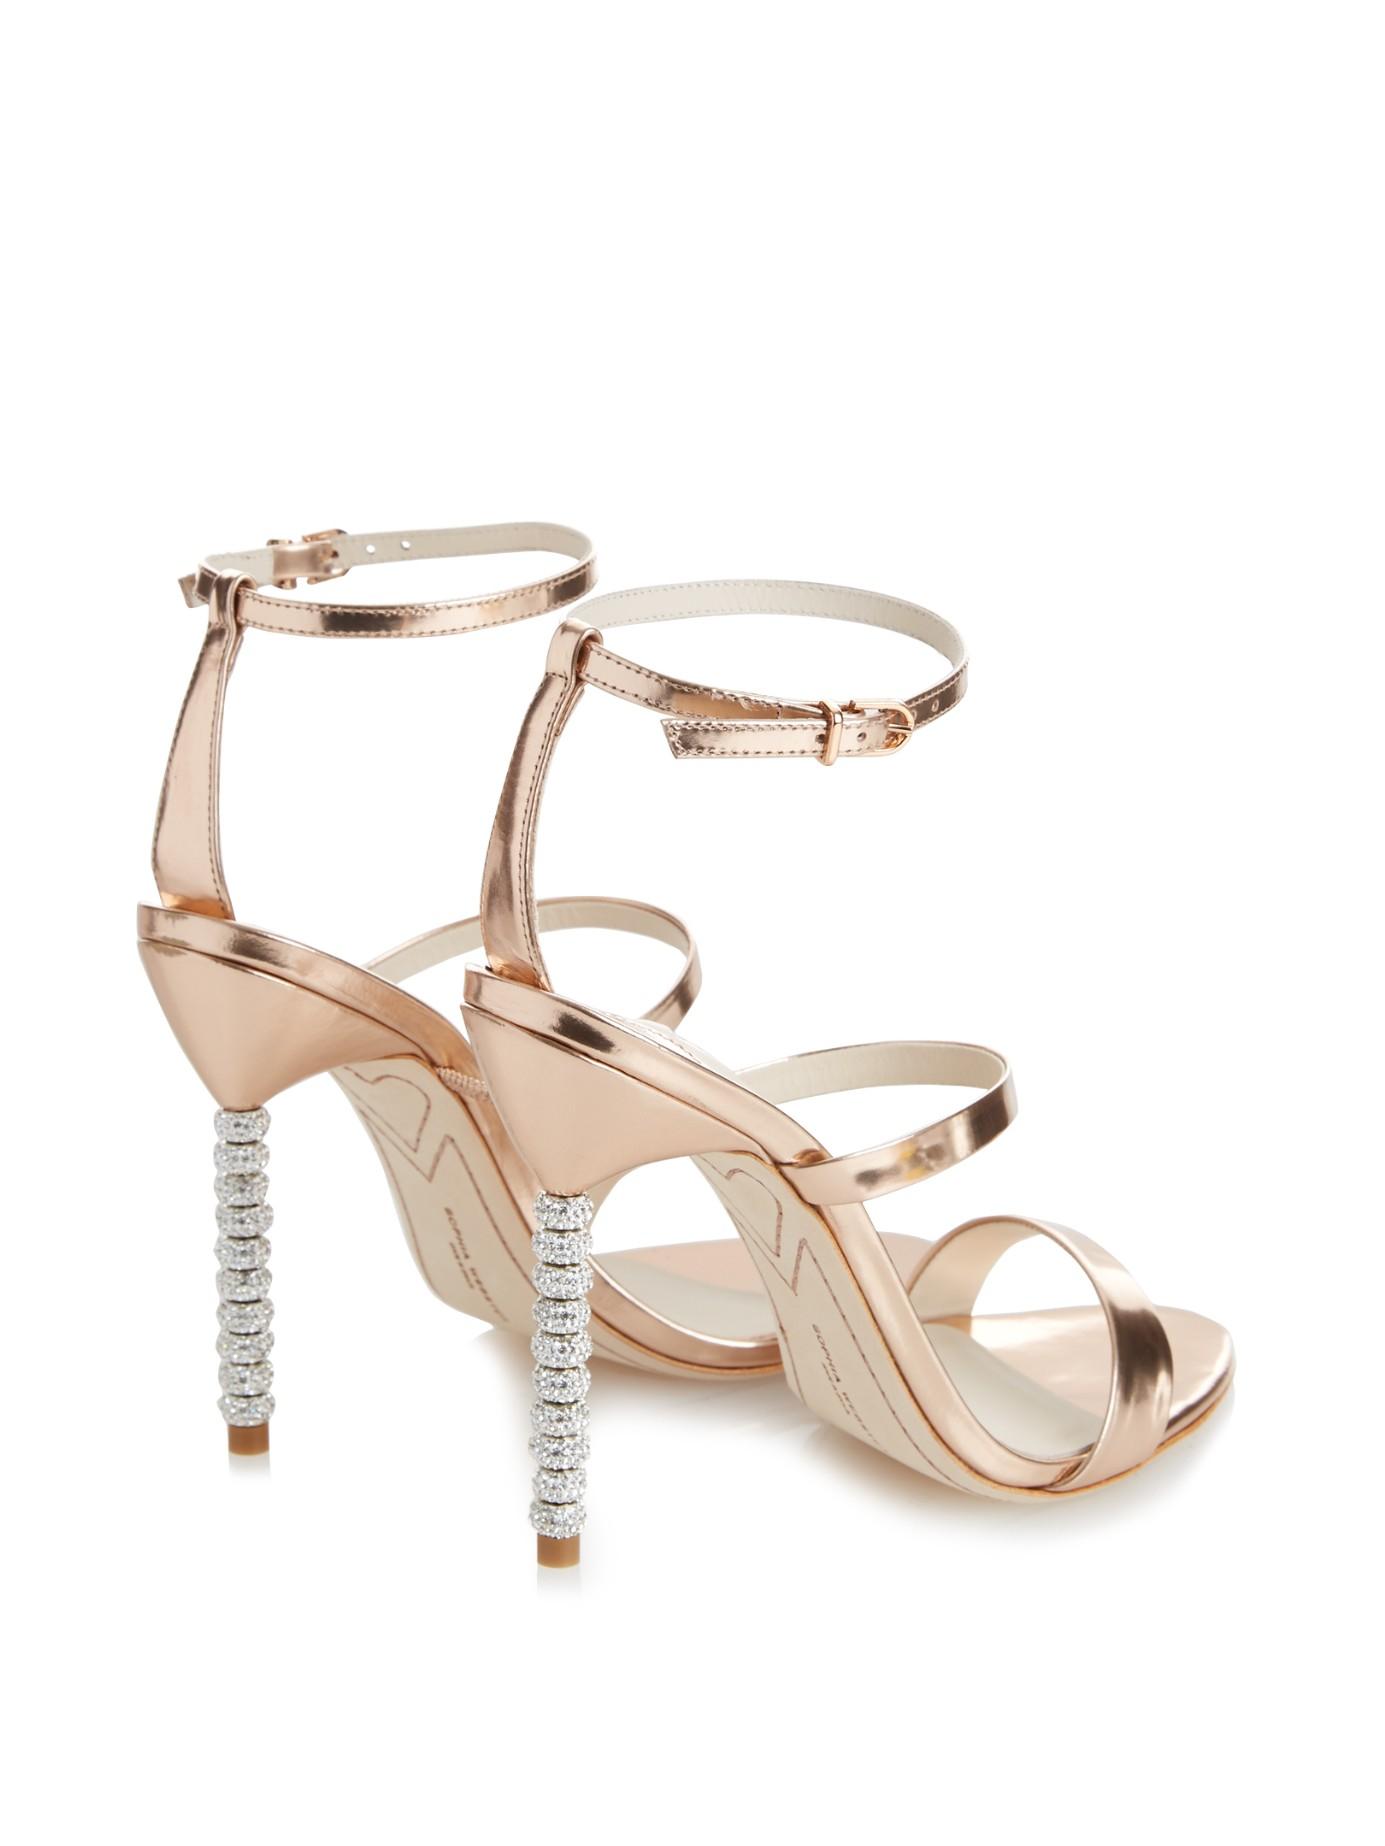 49965a443dc Sophia Webster Rosalind Crystal-Heel Metallic Leather Sandals in Metallic -  Lyst